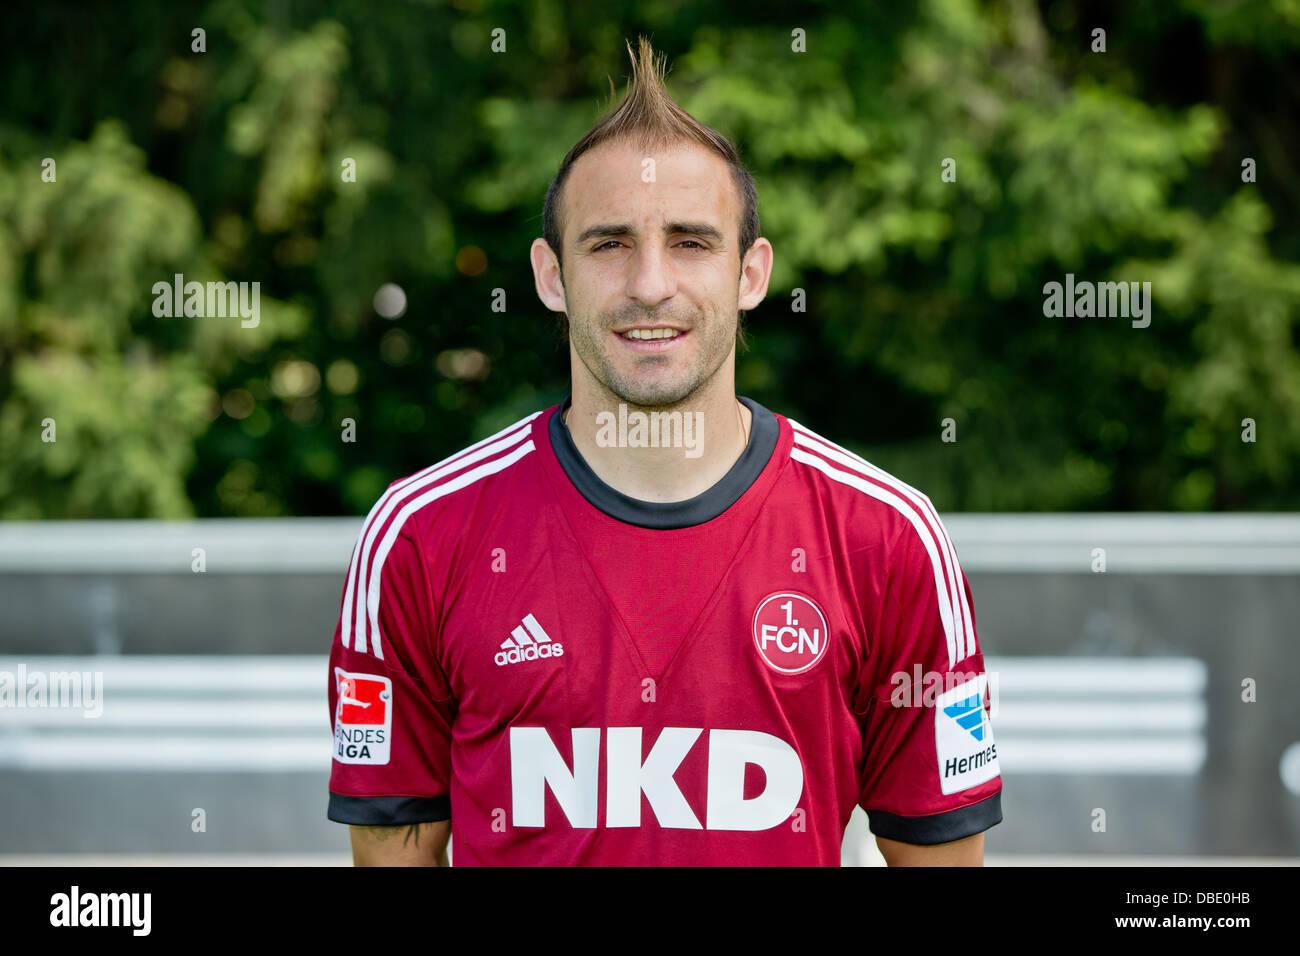 Player Javier Pinola of German Bundesliga club 1. FC Nurnberg during the official photocall for the season 2013 - Stock Image